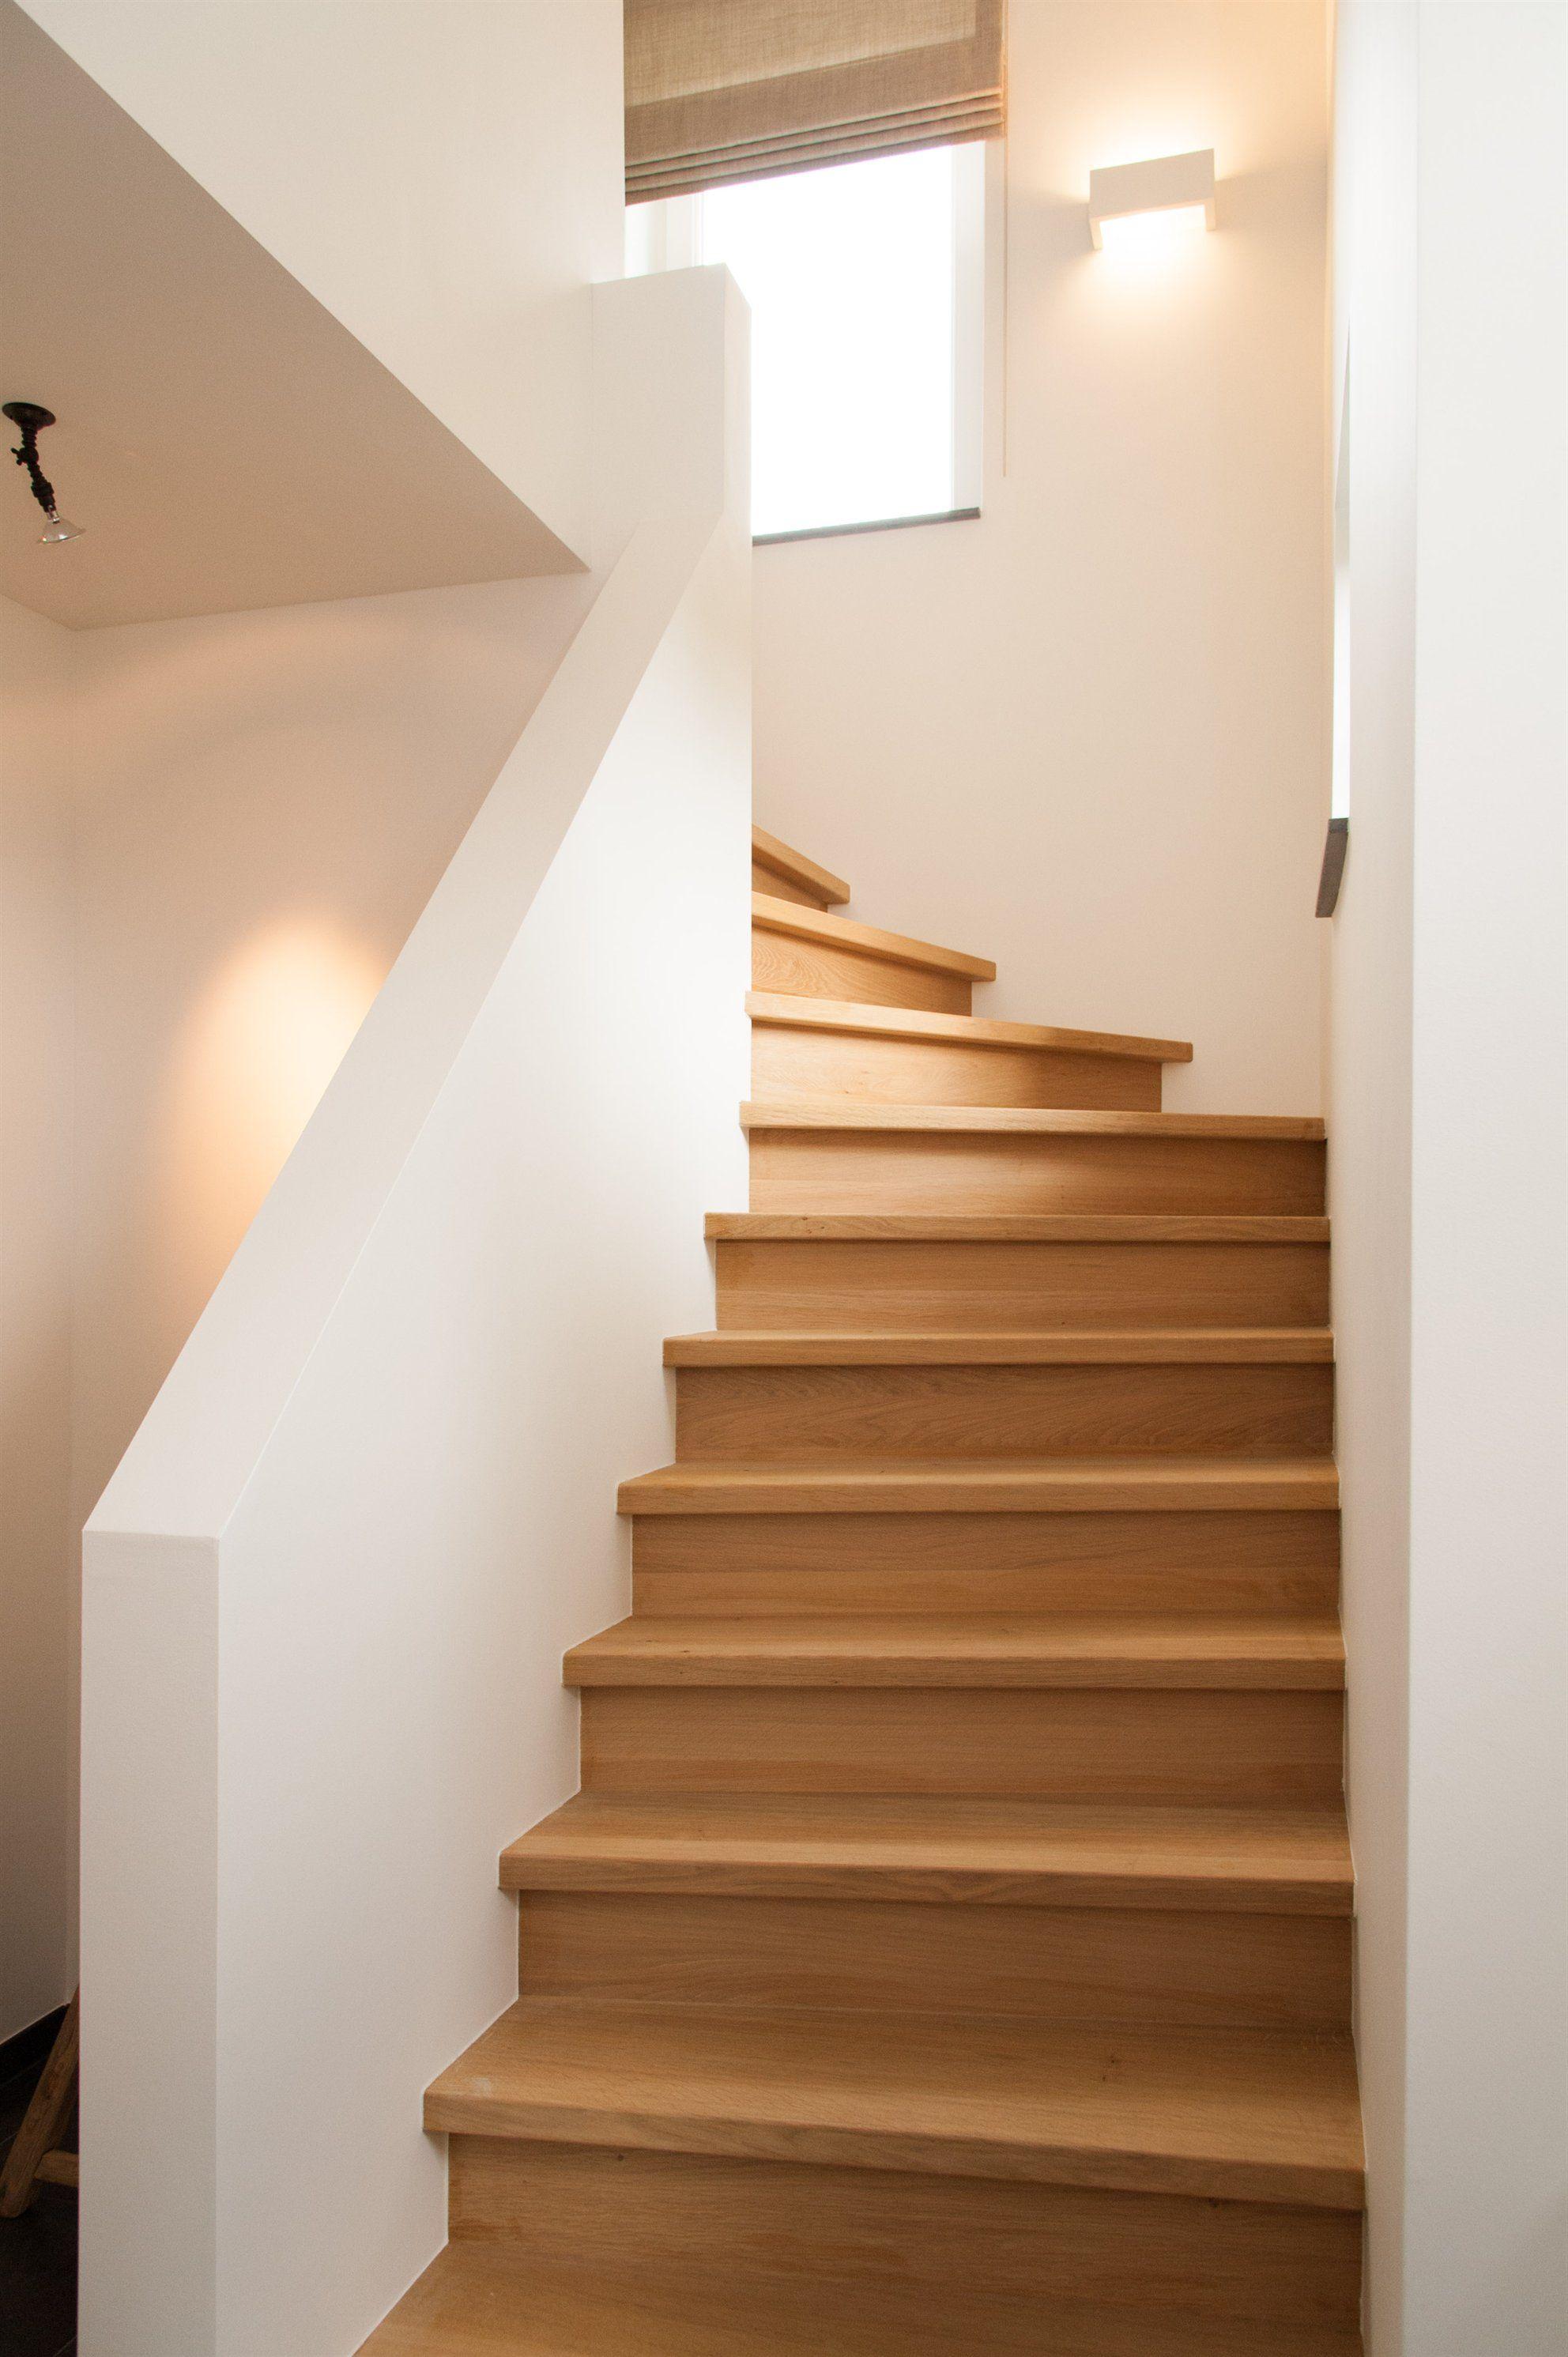 hal uplight hal trap pinterest treppe treppenhaus und stiegen. Black Bedroom Furniture Sets. Home Design Ideas